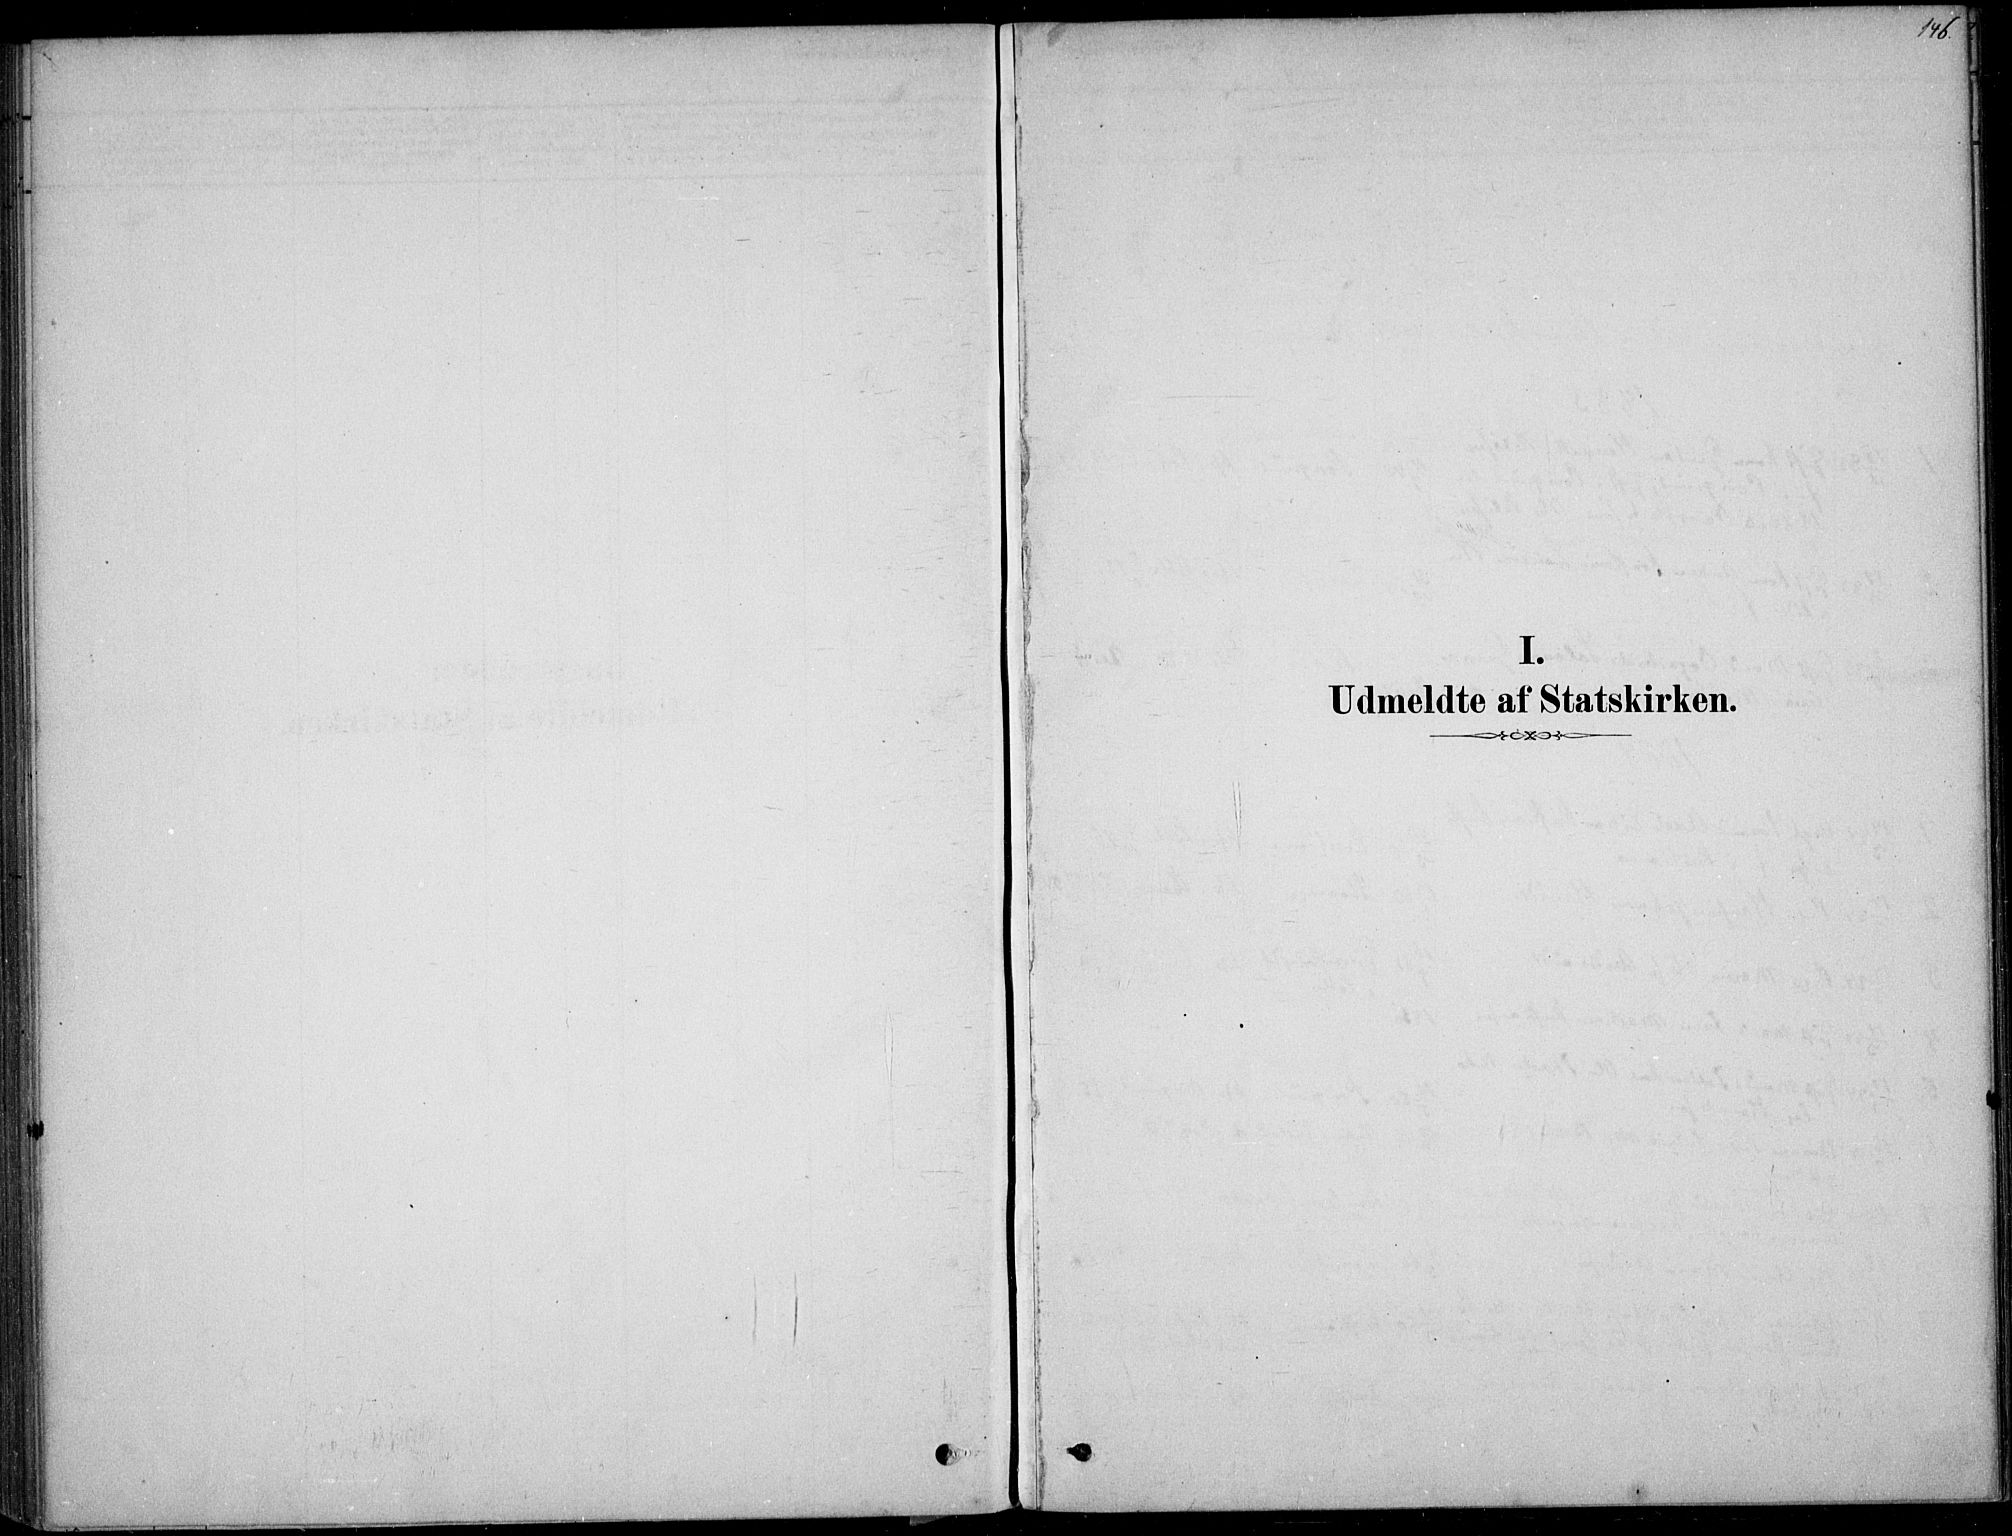 SAKO, Langesund kirkebøker, F/Fa/L0002: Ministerialbok nr. 2, 1878-1892, s. 146